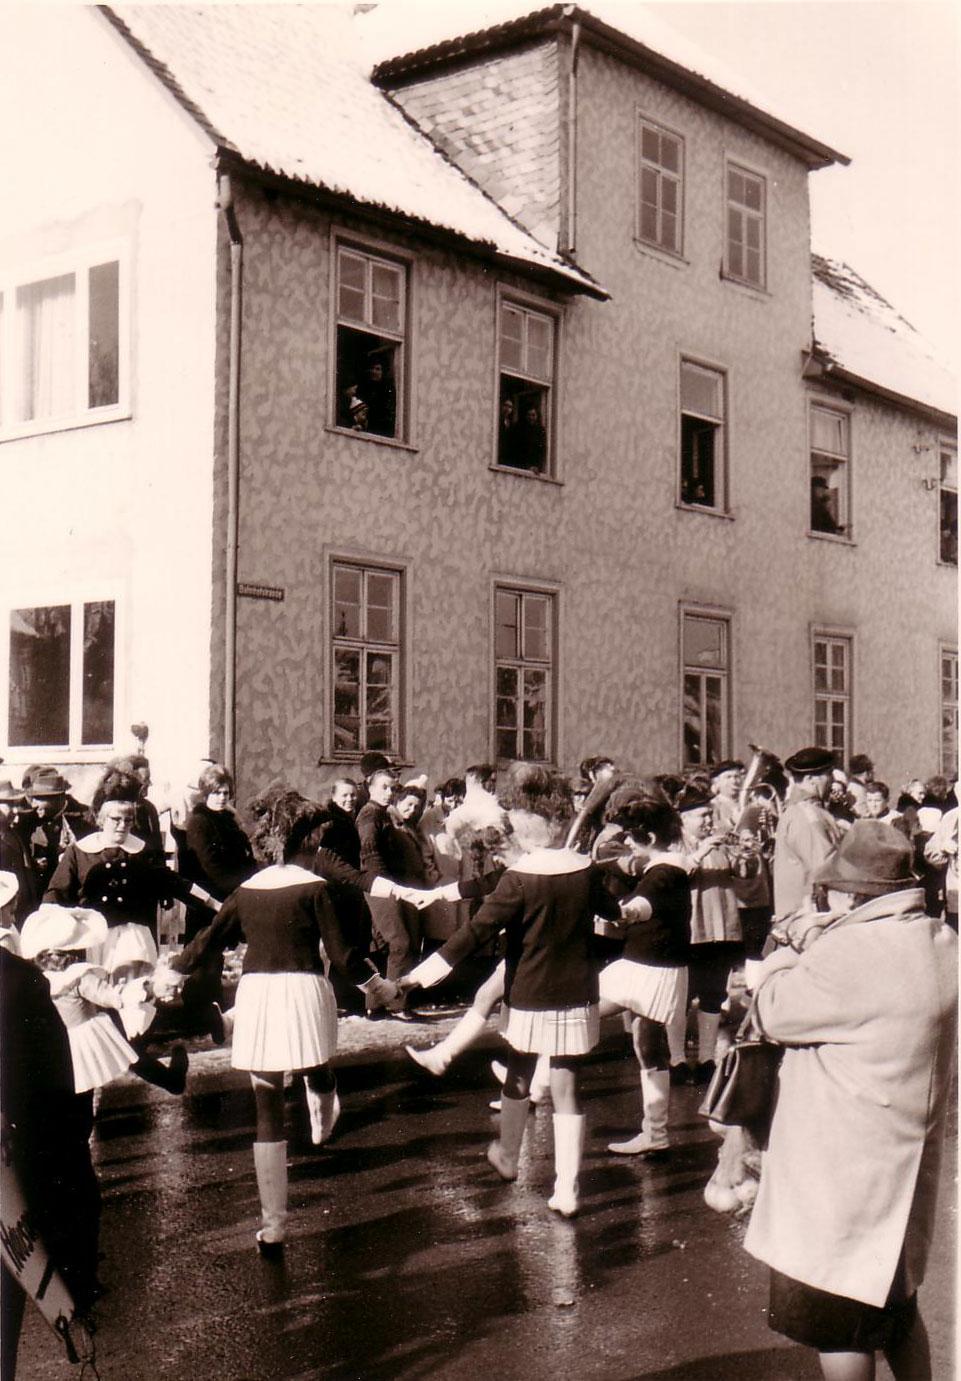 Karneval in Naumburg